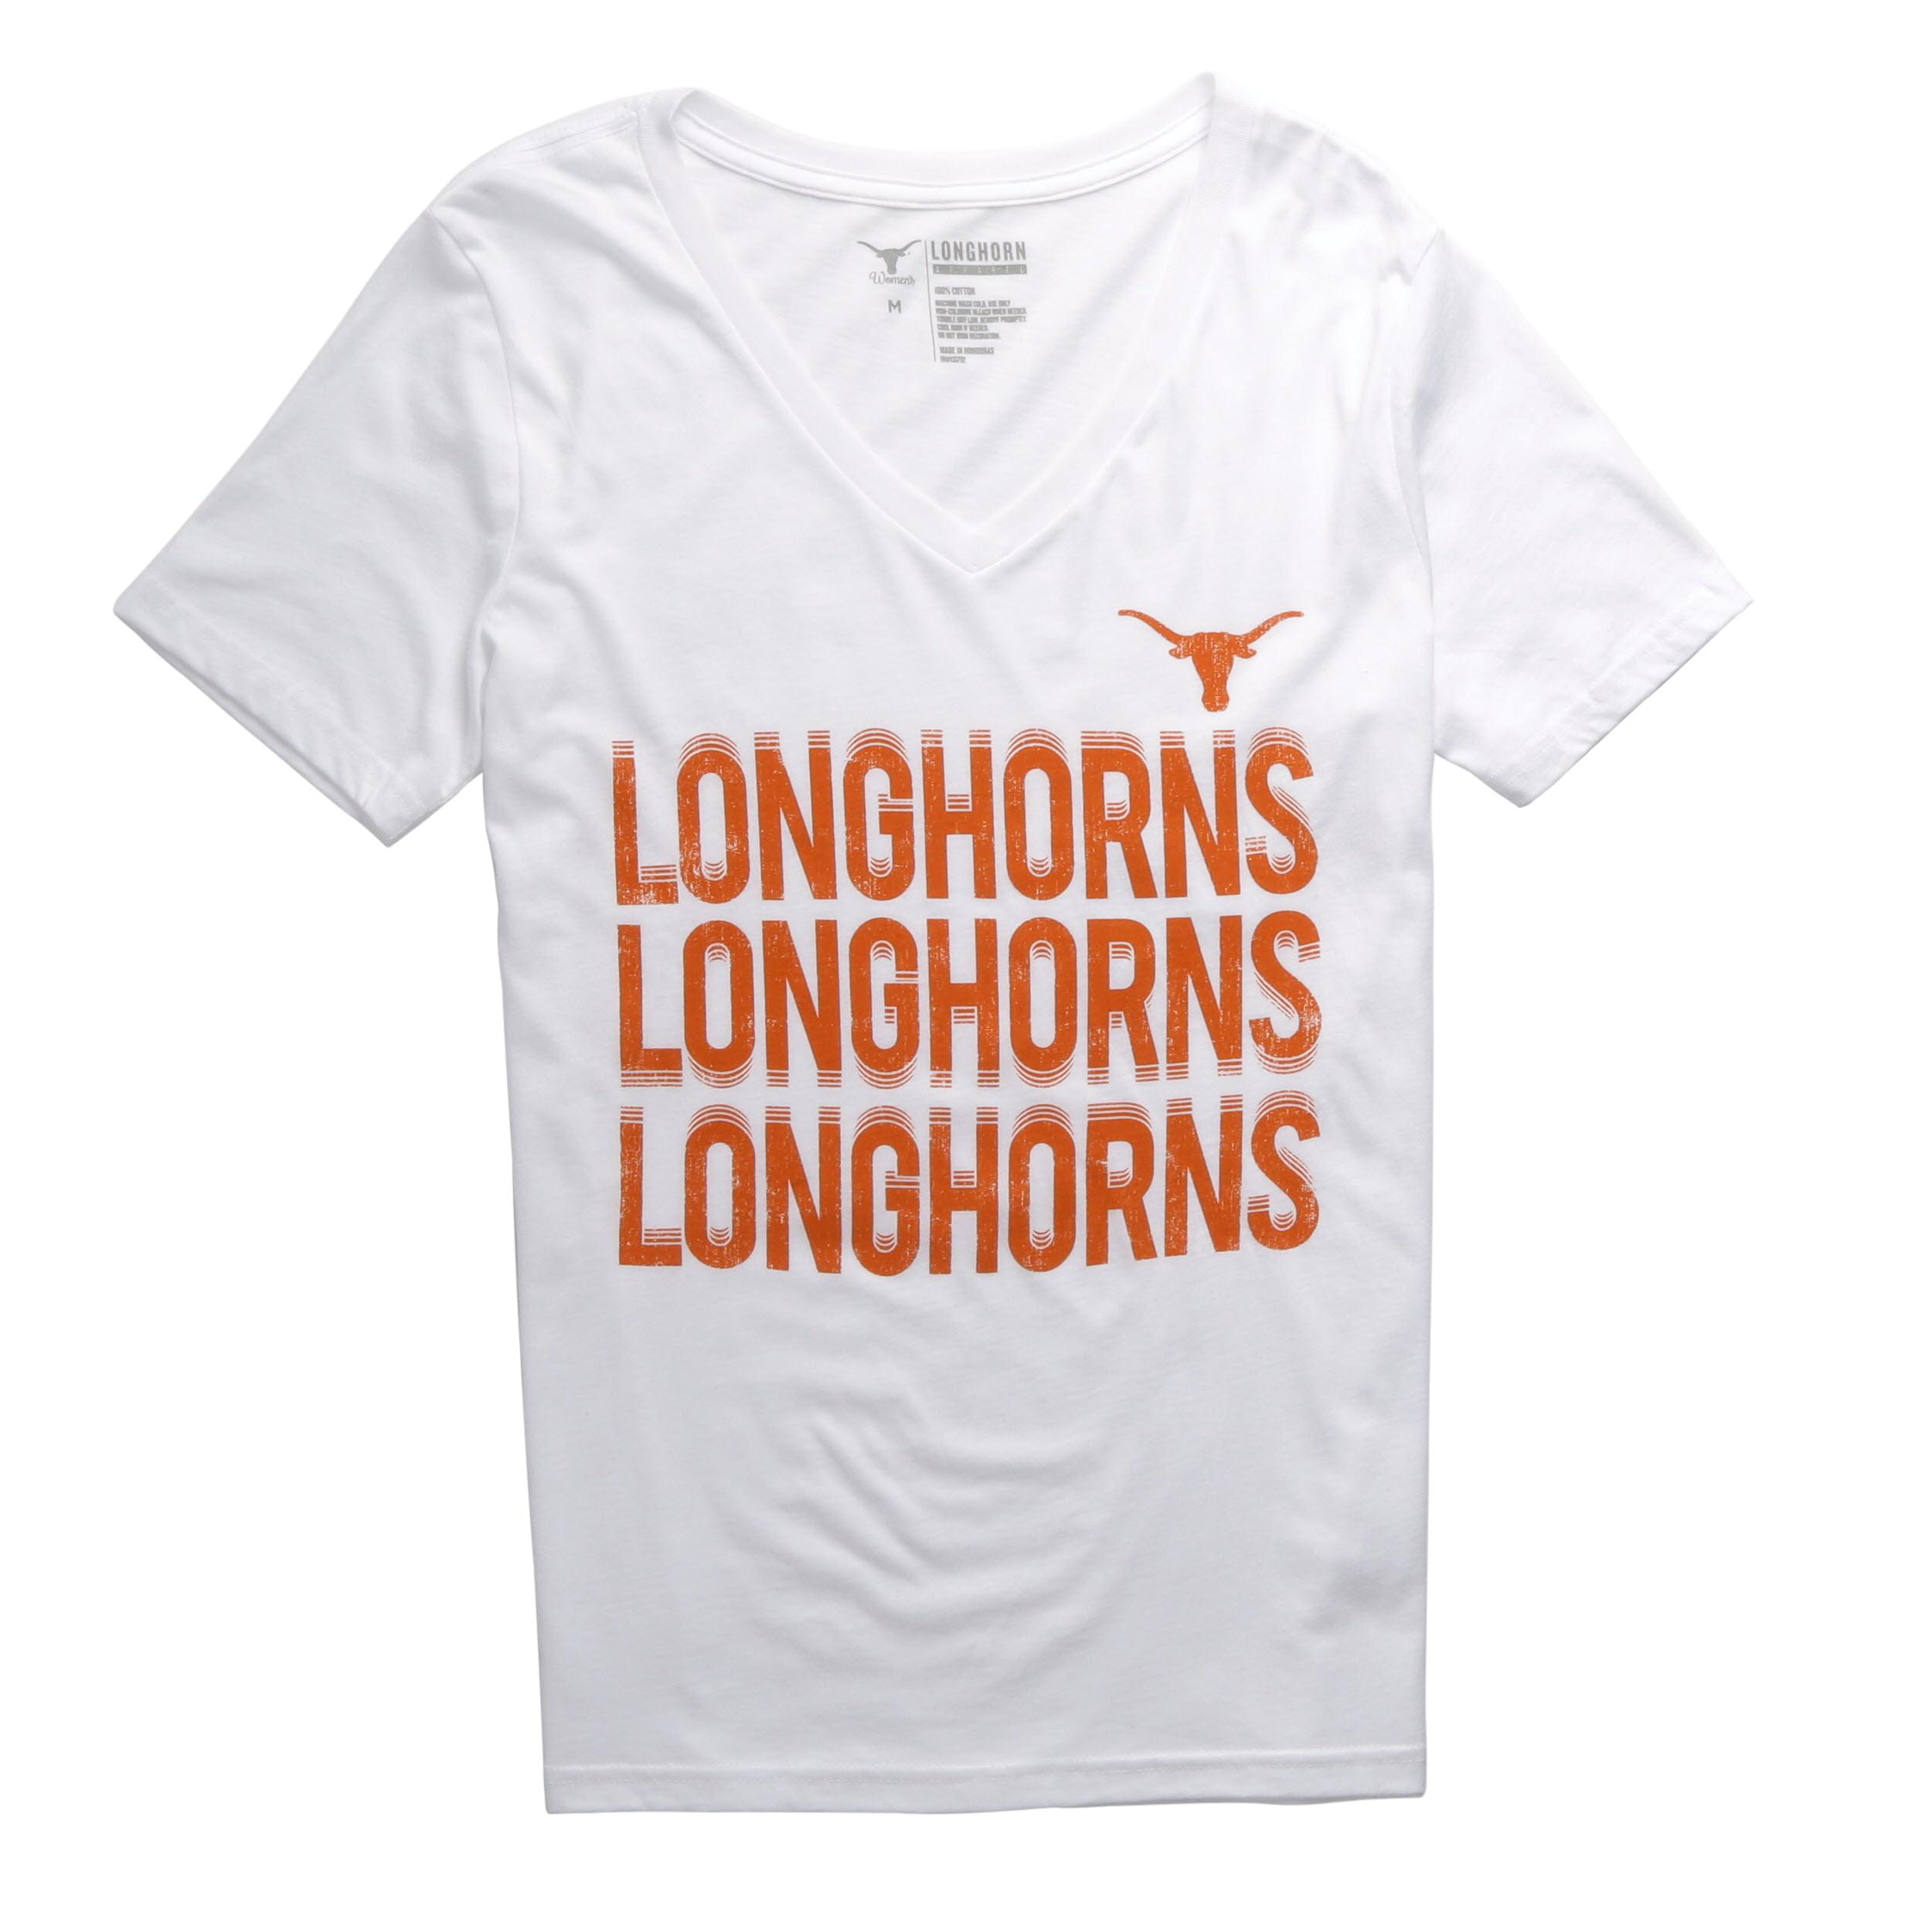 NCAA Texas Longhorns Women's Stacked Motion V Neck Short Sleeve Tee Shirt